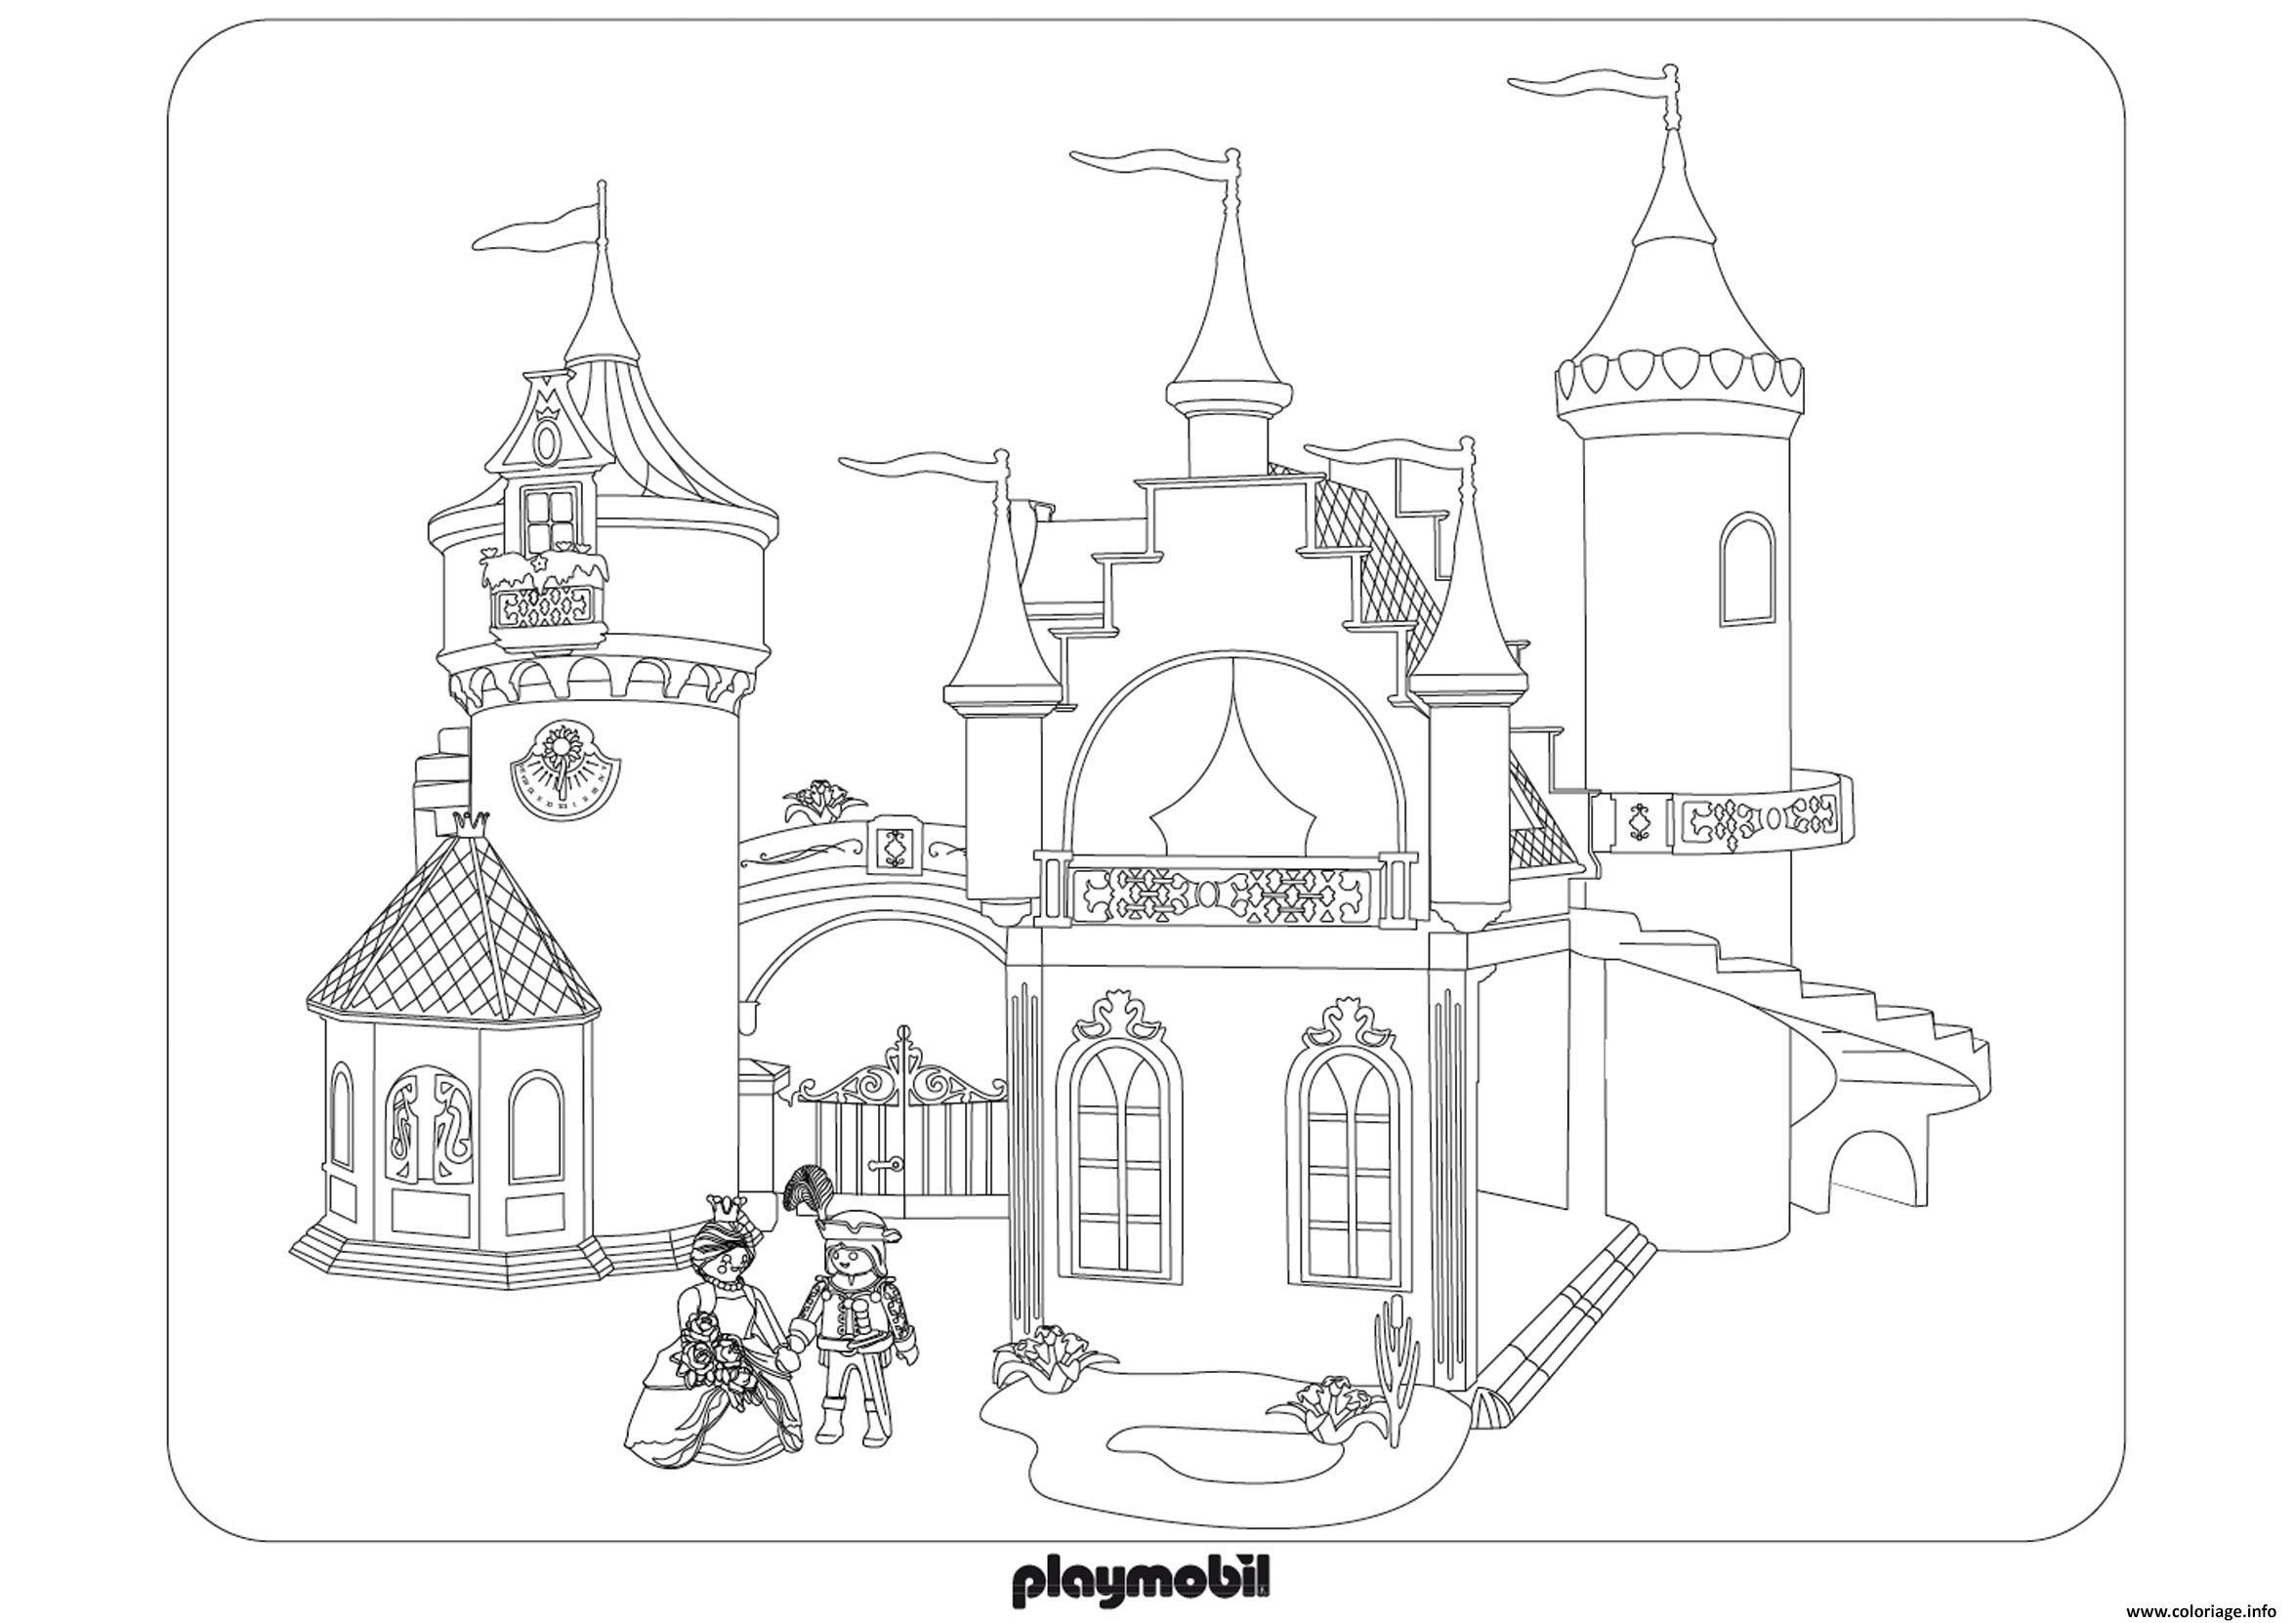 Coloriage Chateau Roi Reine Princesse Playmobil Dessin avec Dessin Chateau Princesse